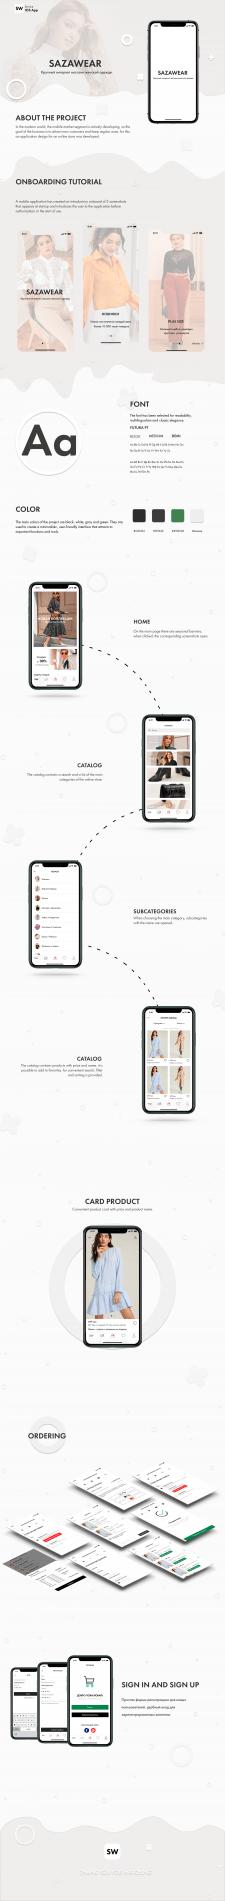 SAZAWEAR - UX/UI Mobile app design for iOS